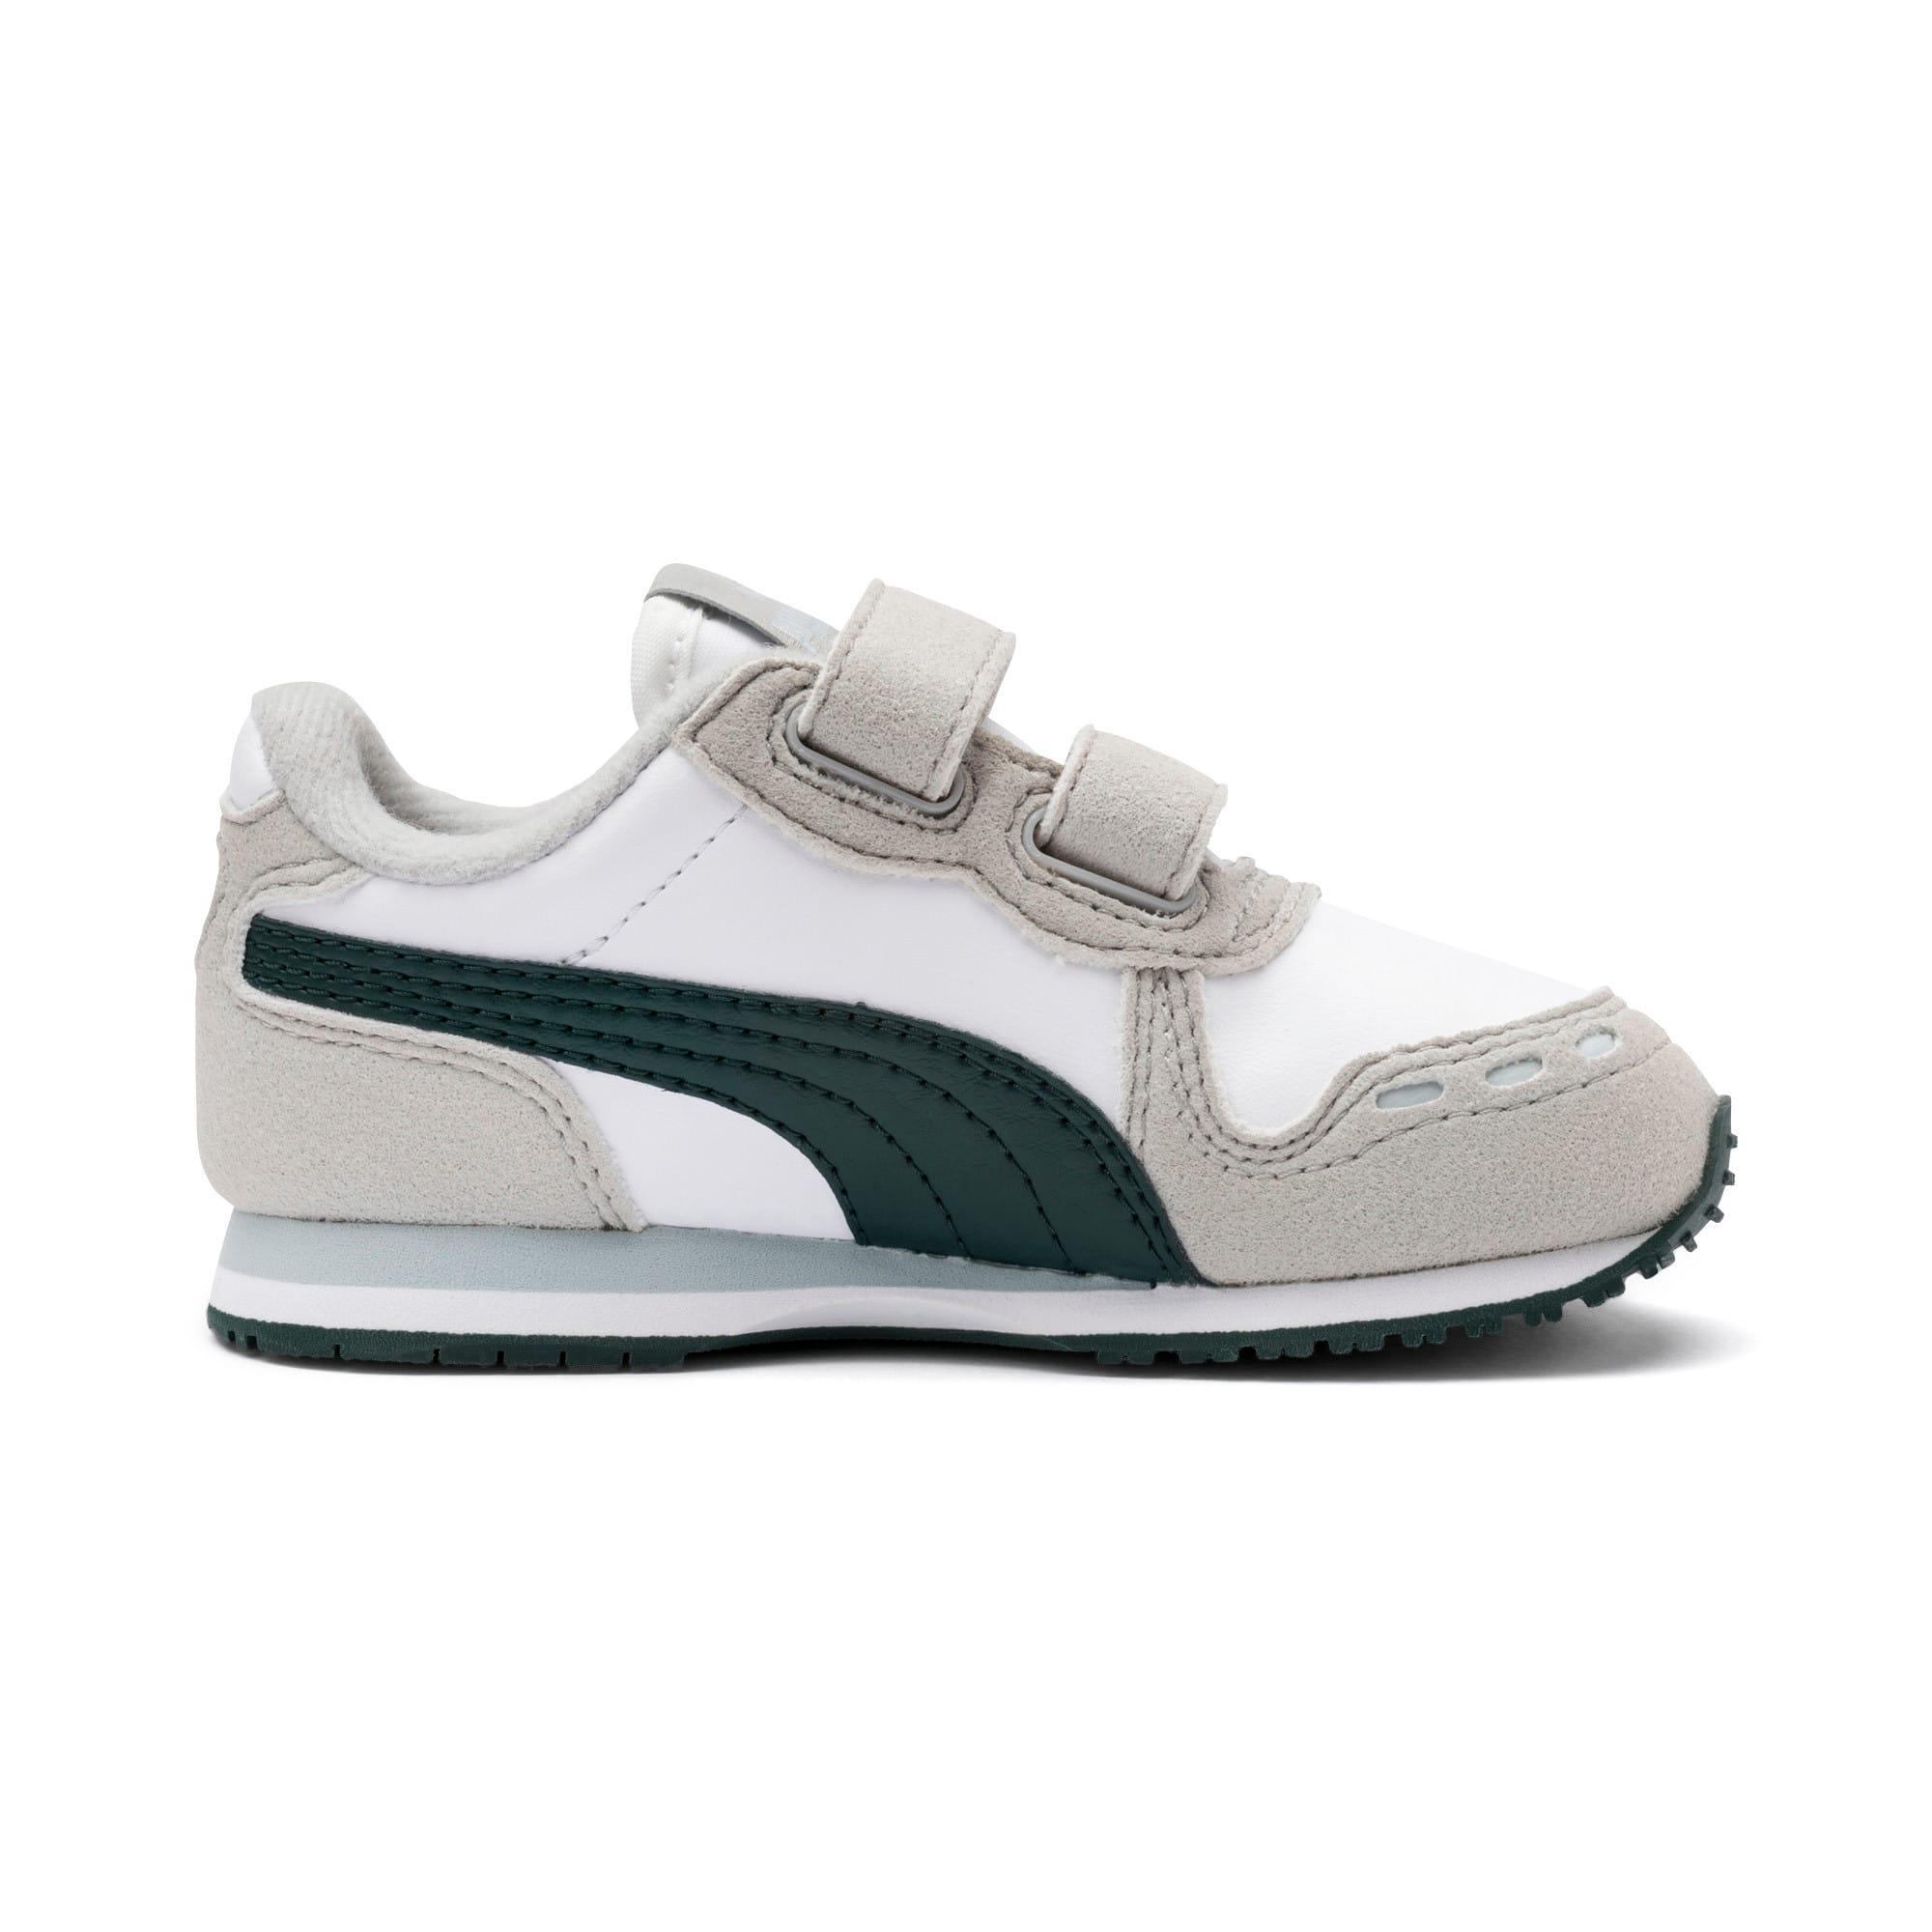 Thumbnail 5 of Cabana Racer SL Toddler Shoes, Puma White-Gray Violet, medium